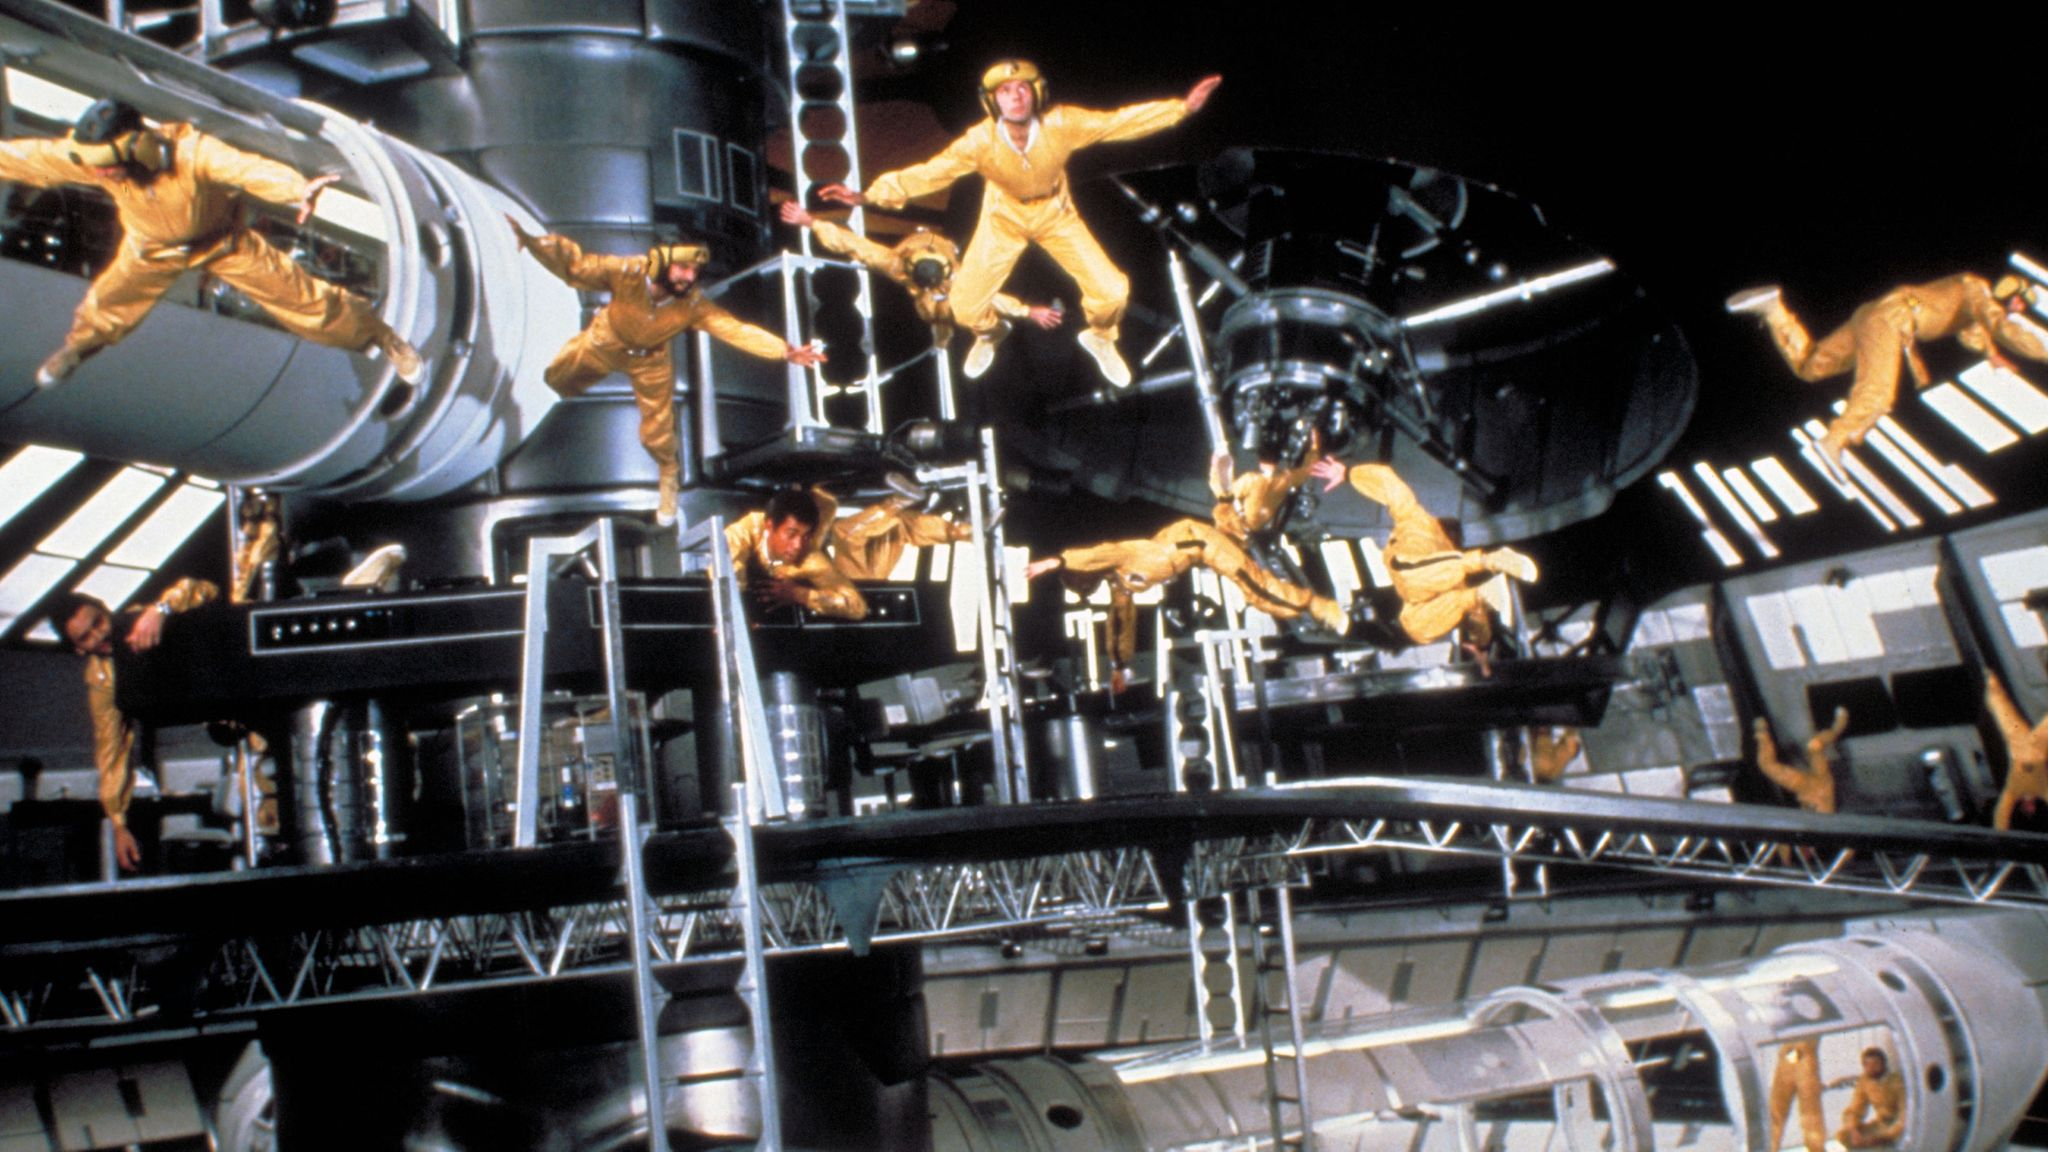 Moonraker (1979) 1979